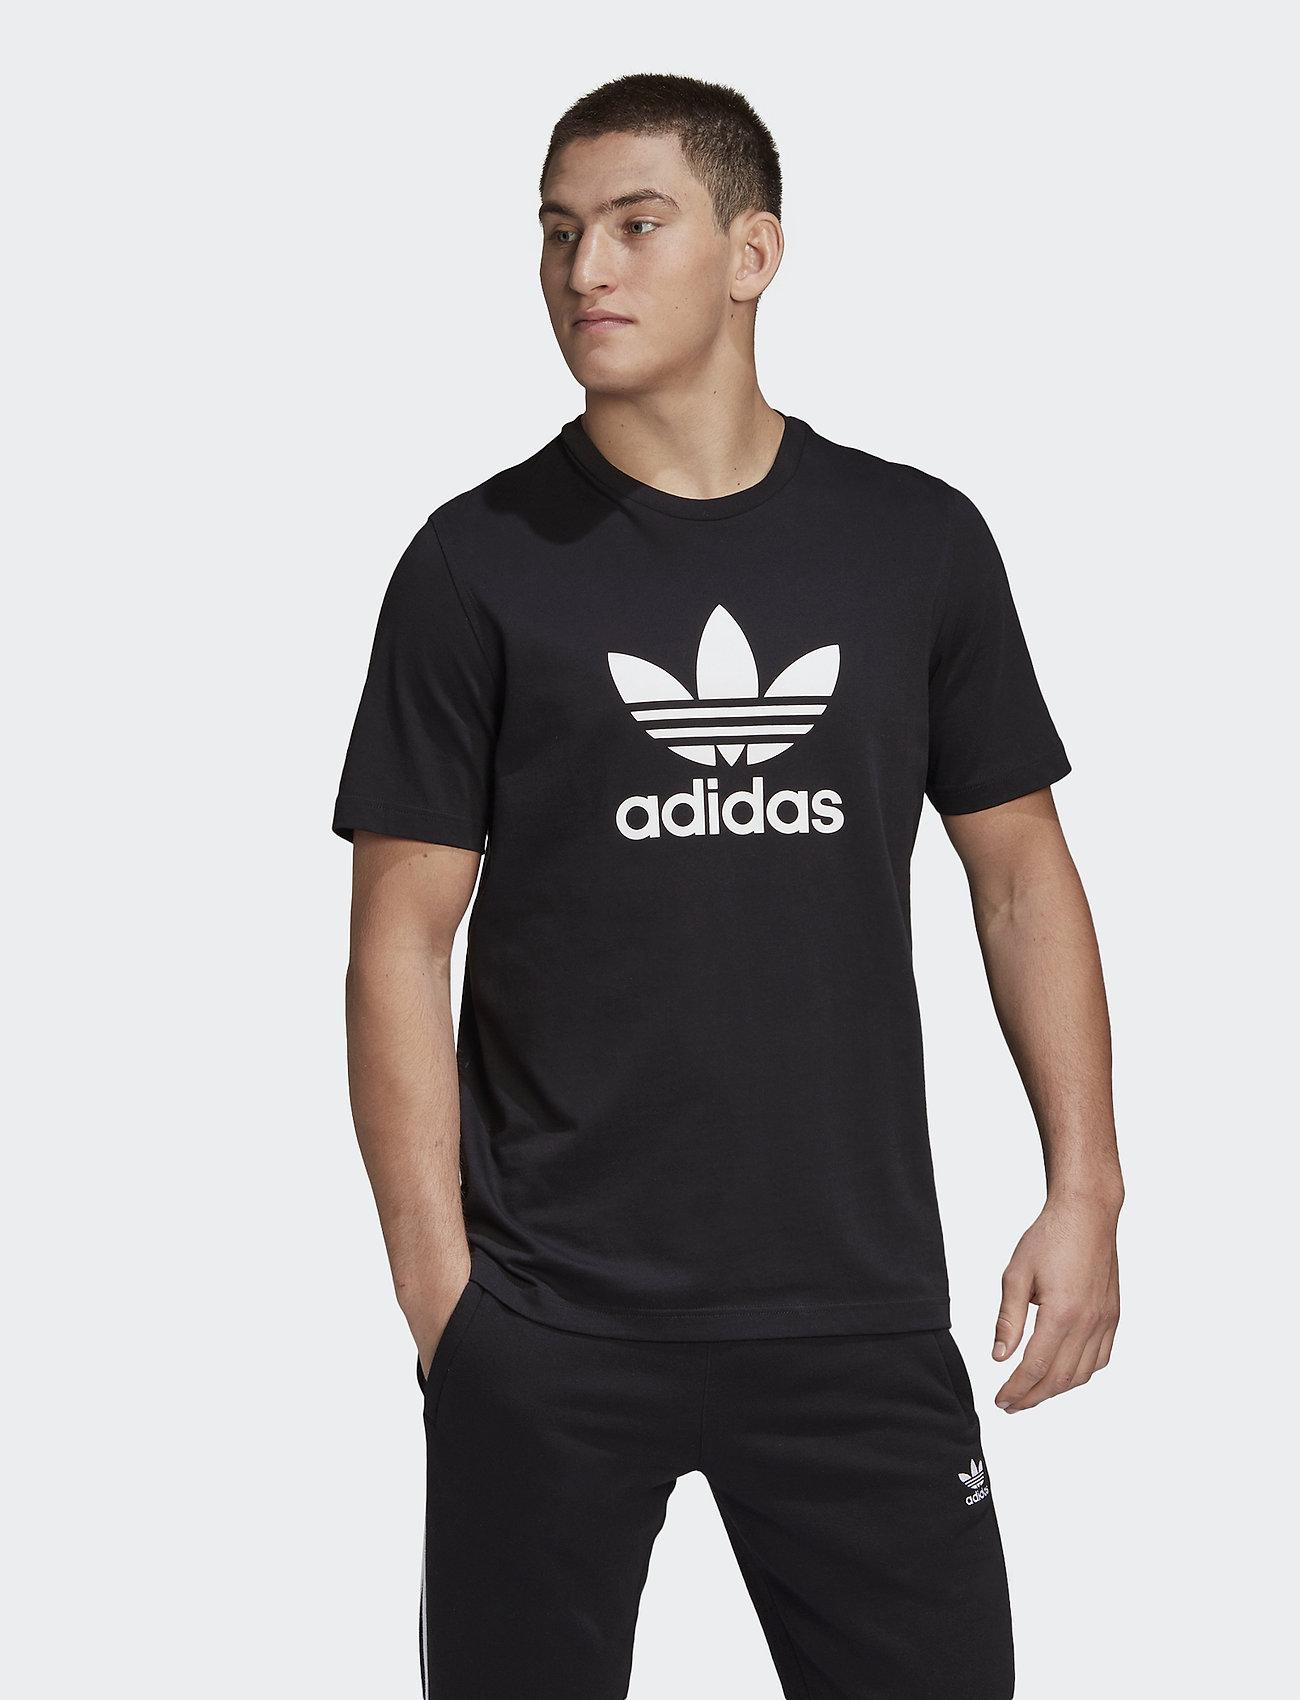 adidas Originals Trefoil T-shirt - T-Shirts | Boozt.com